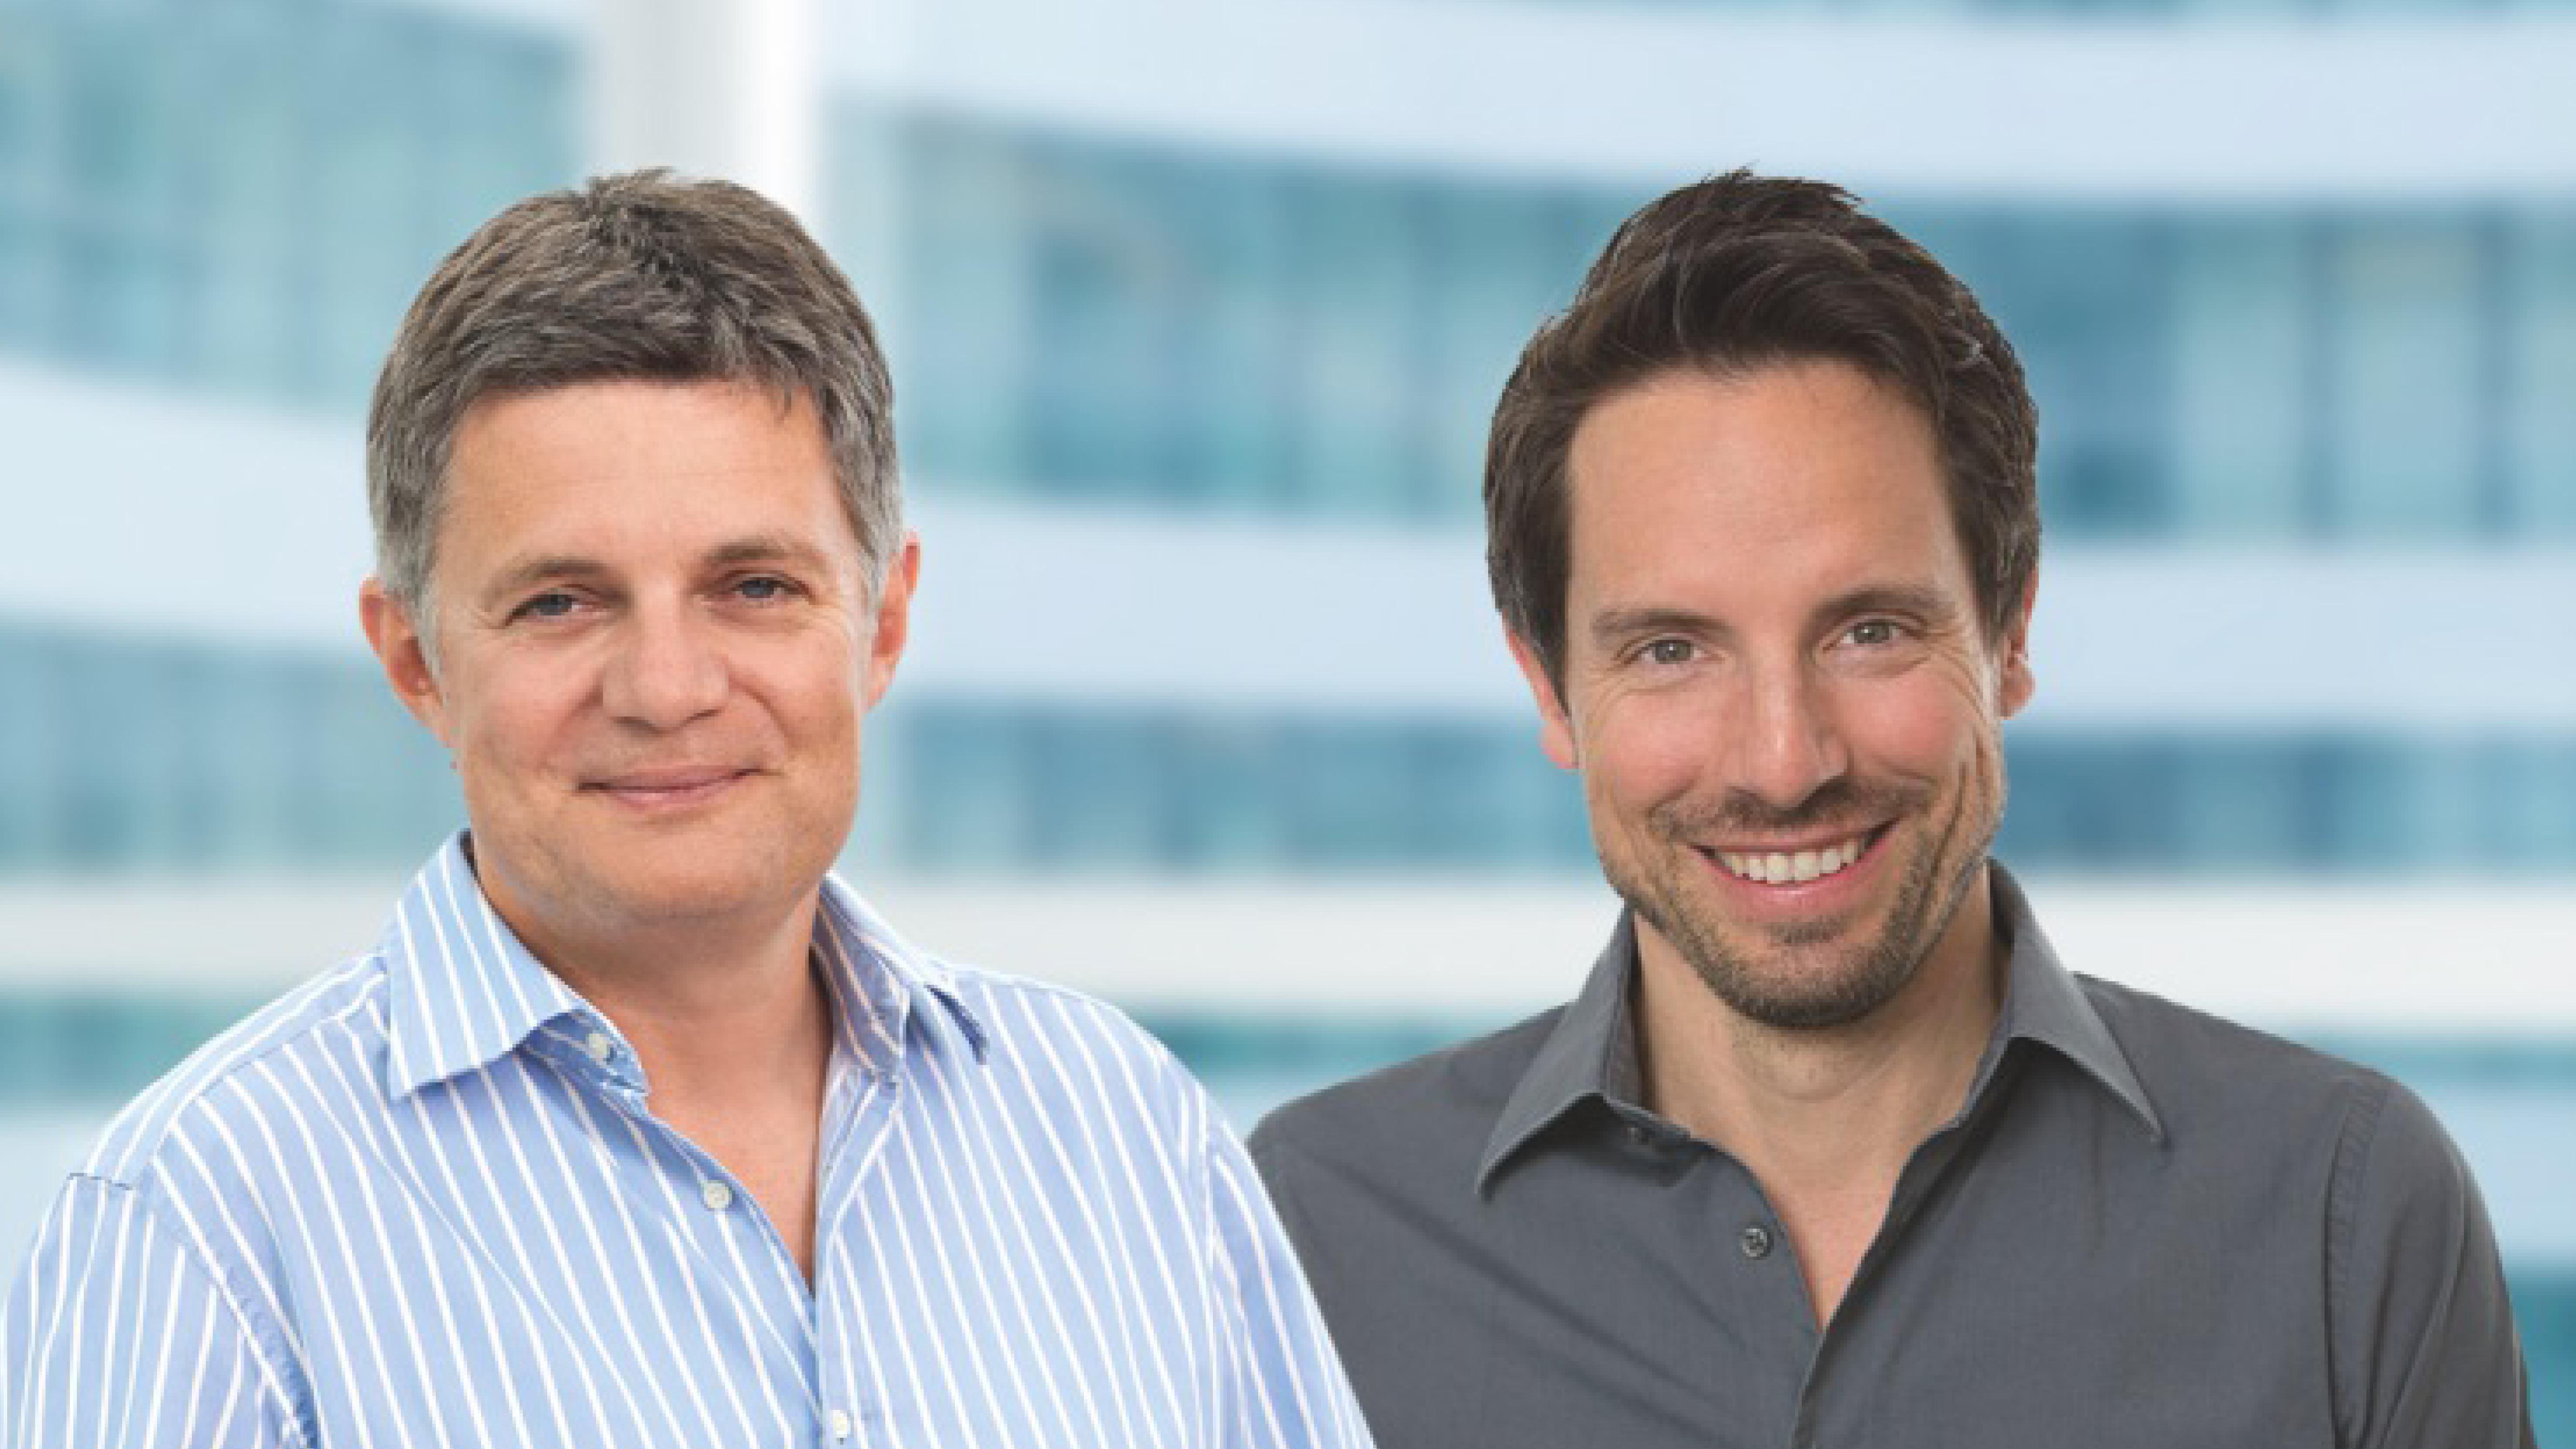 Dr. med. Rainer Wiltfang und Dr. med. Martin Bechmann